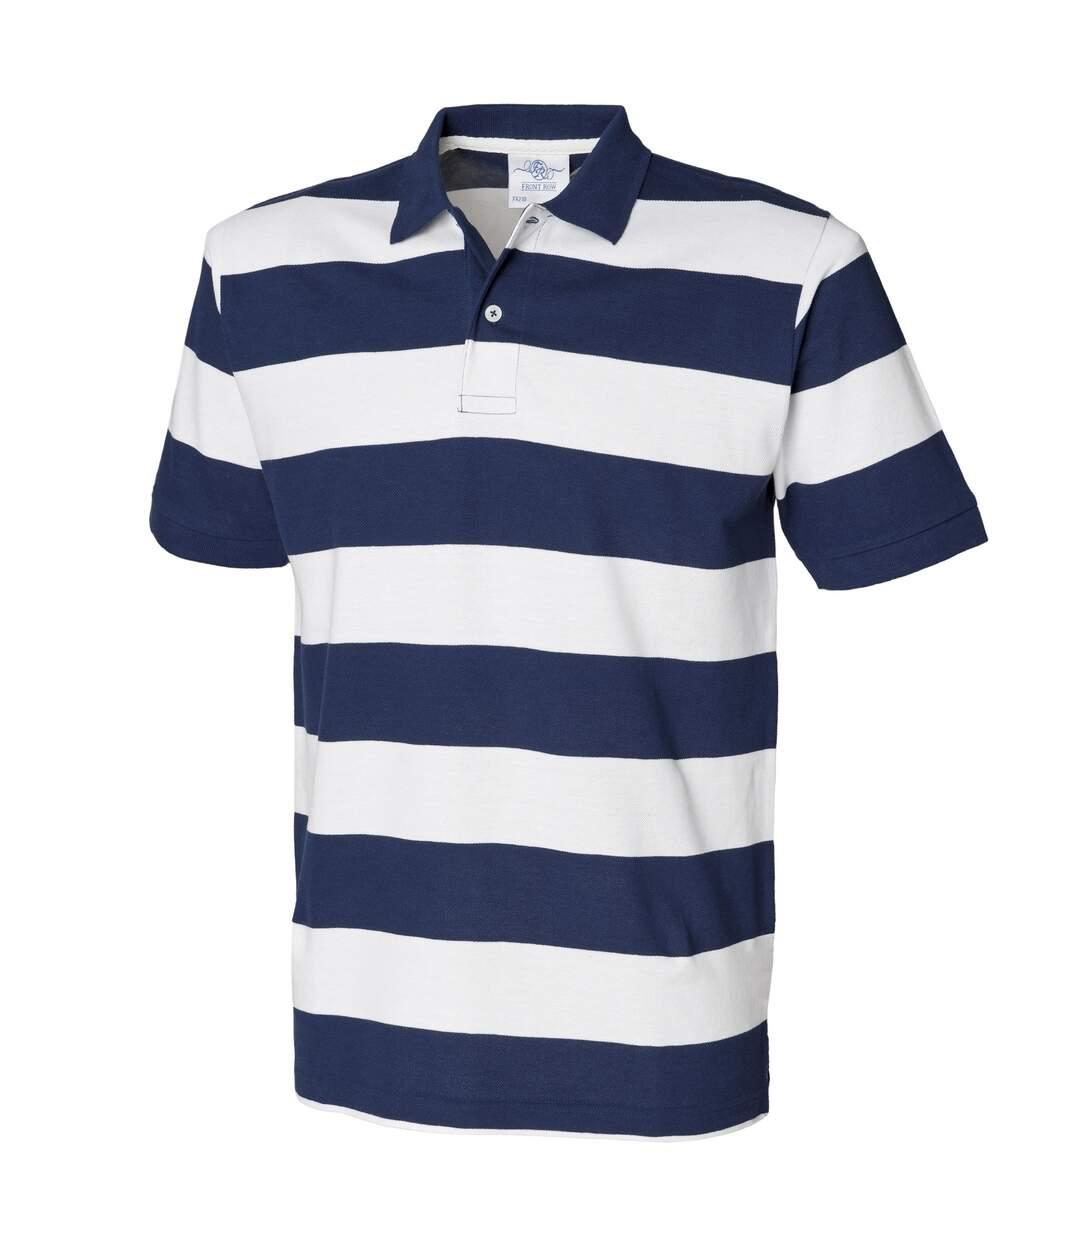 Front Row Mens Striped Pique Polo Shirt (Heather Grey/Navy) - UTRW488